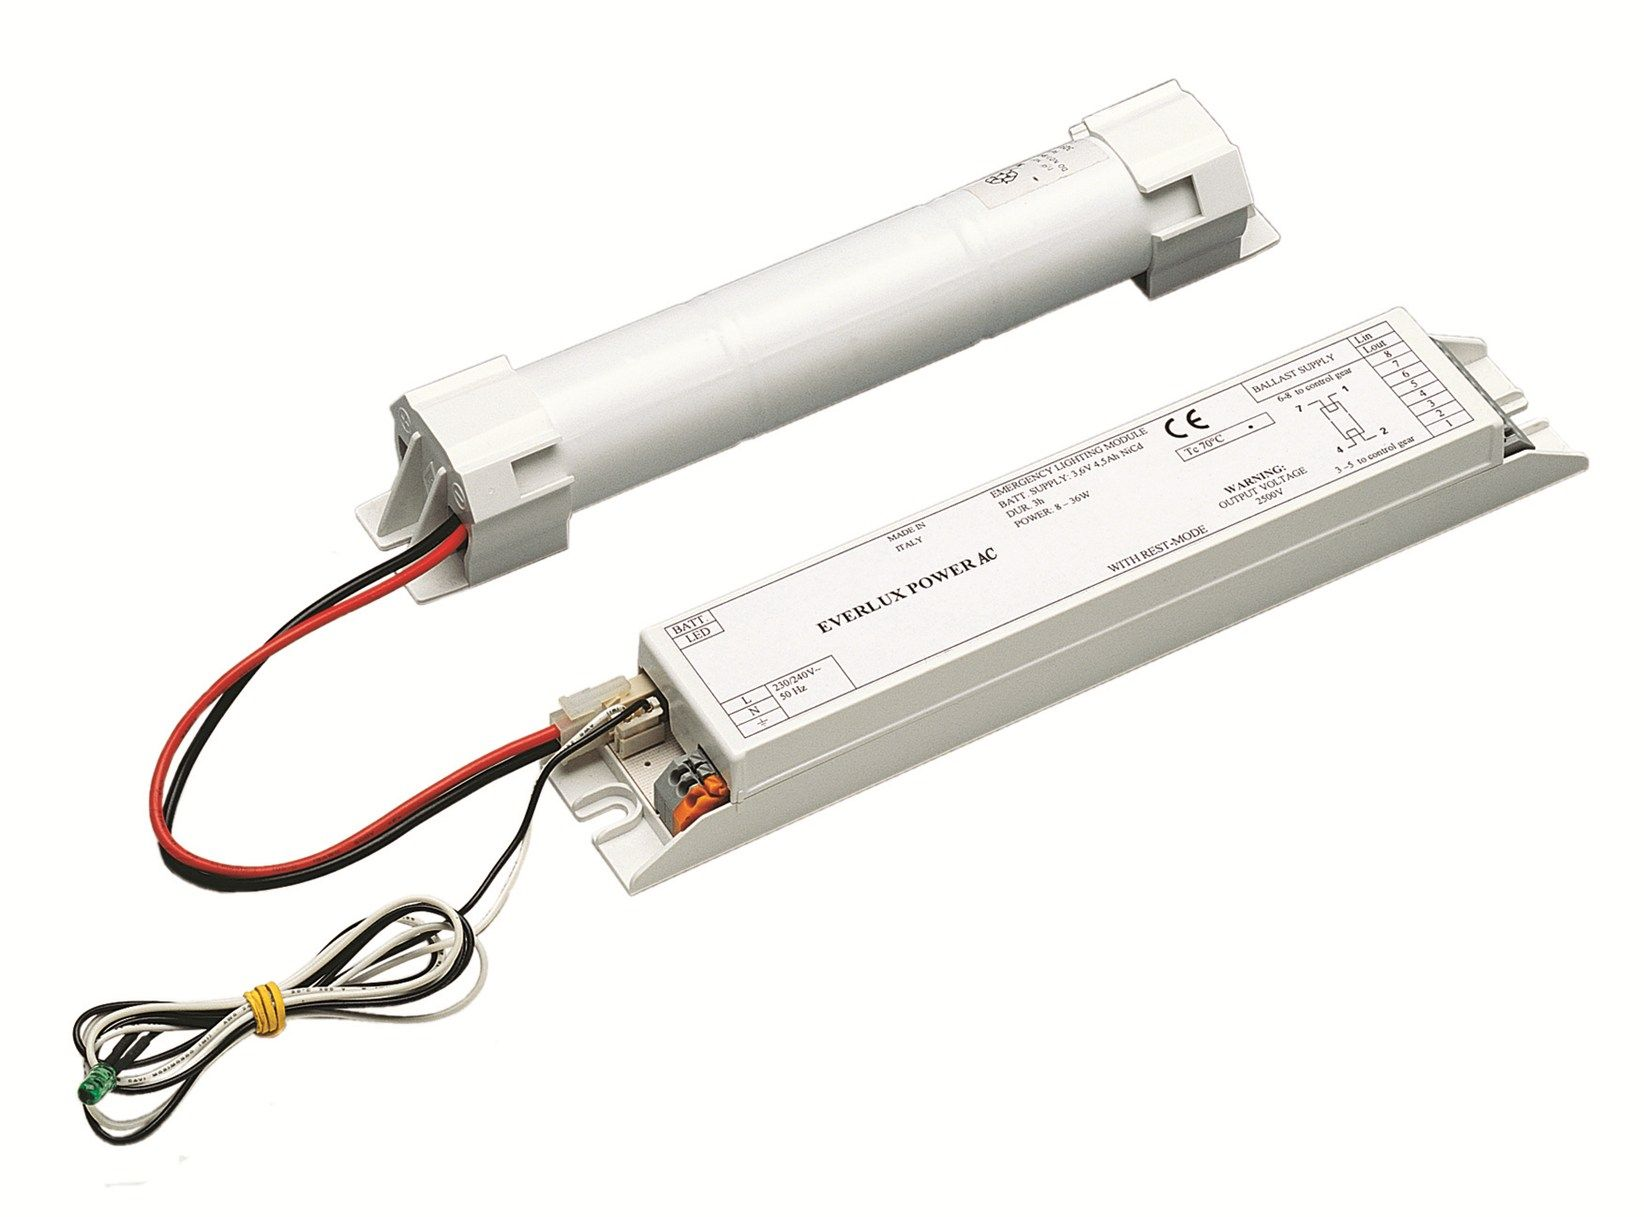 Plafoniere Con Luce Emergenza : Schneider electric presenta evx power ac: kit di illuminazione